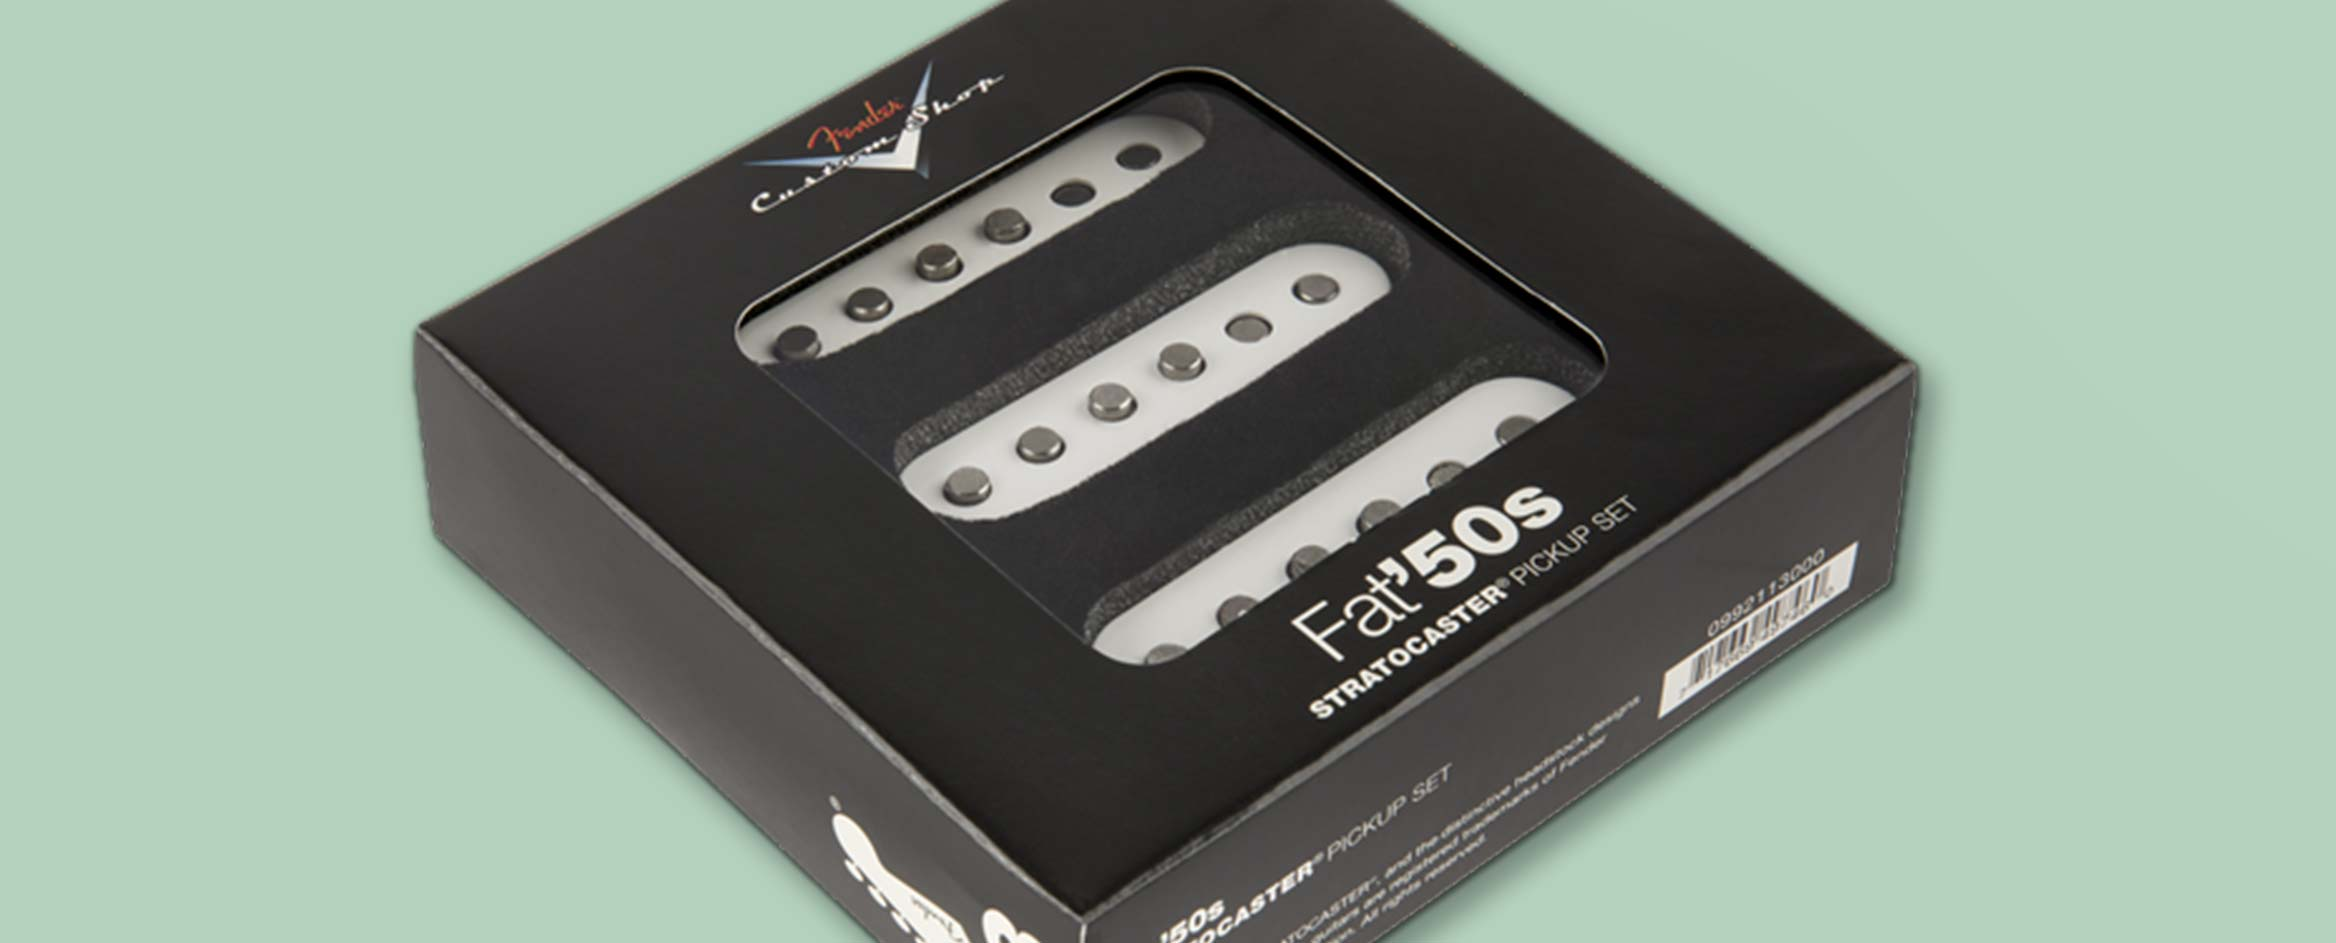 Stratocaster Pickups Guide To Understanding Fender Mim Telecaster Wiring Diagram Scn